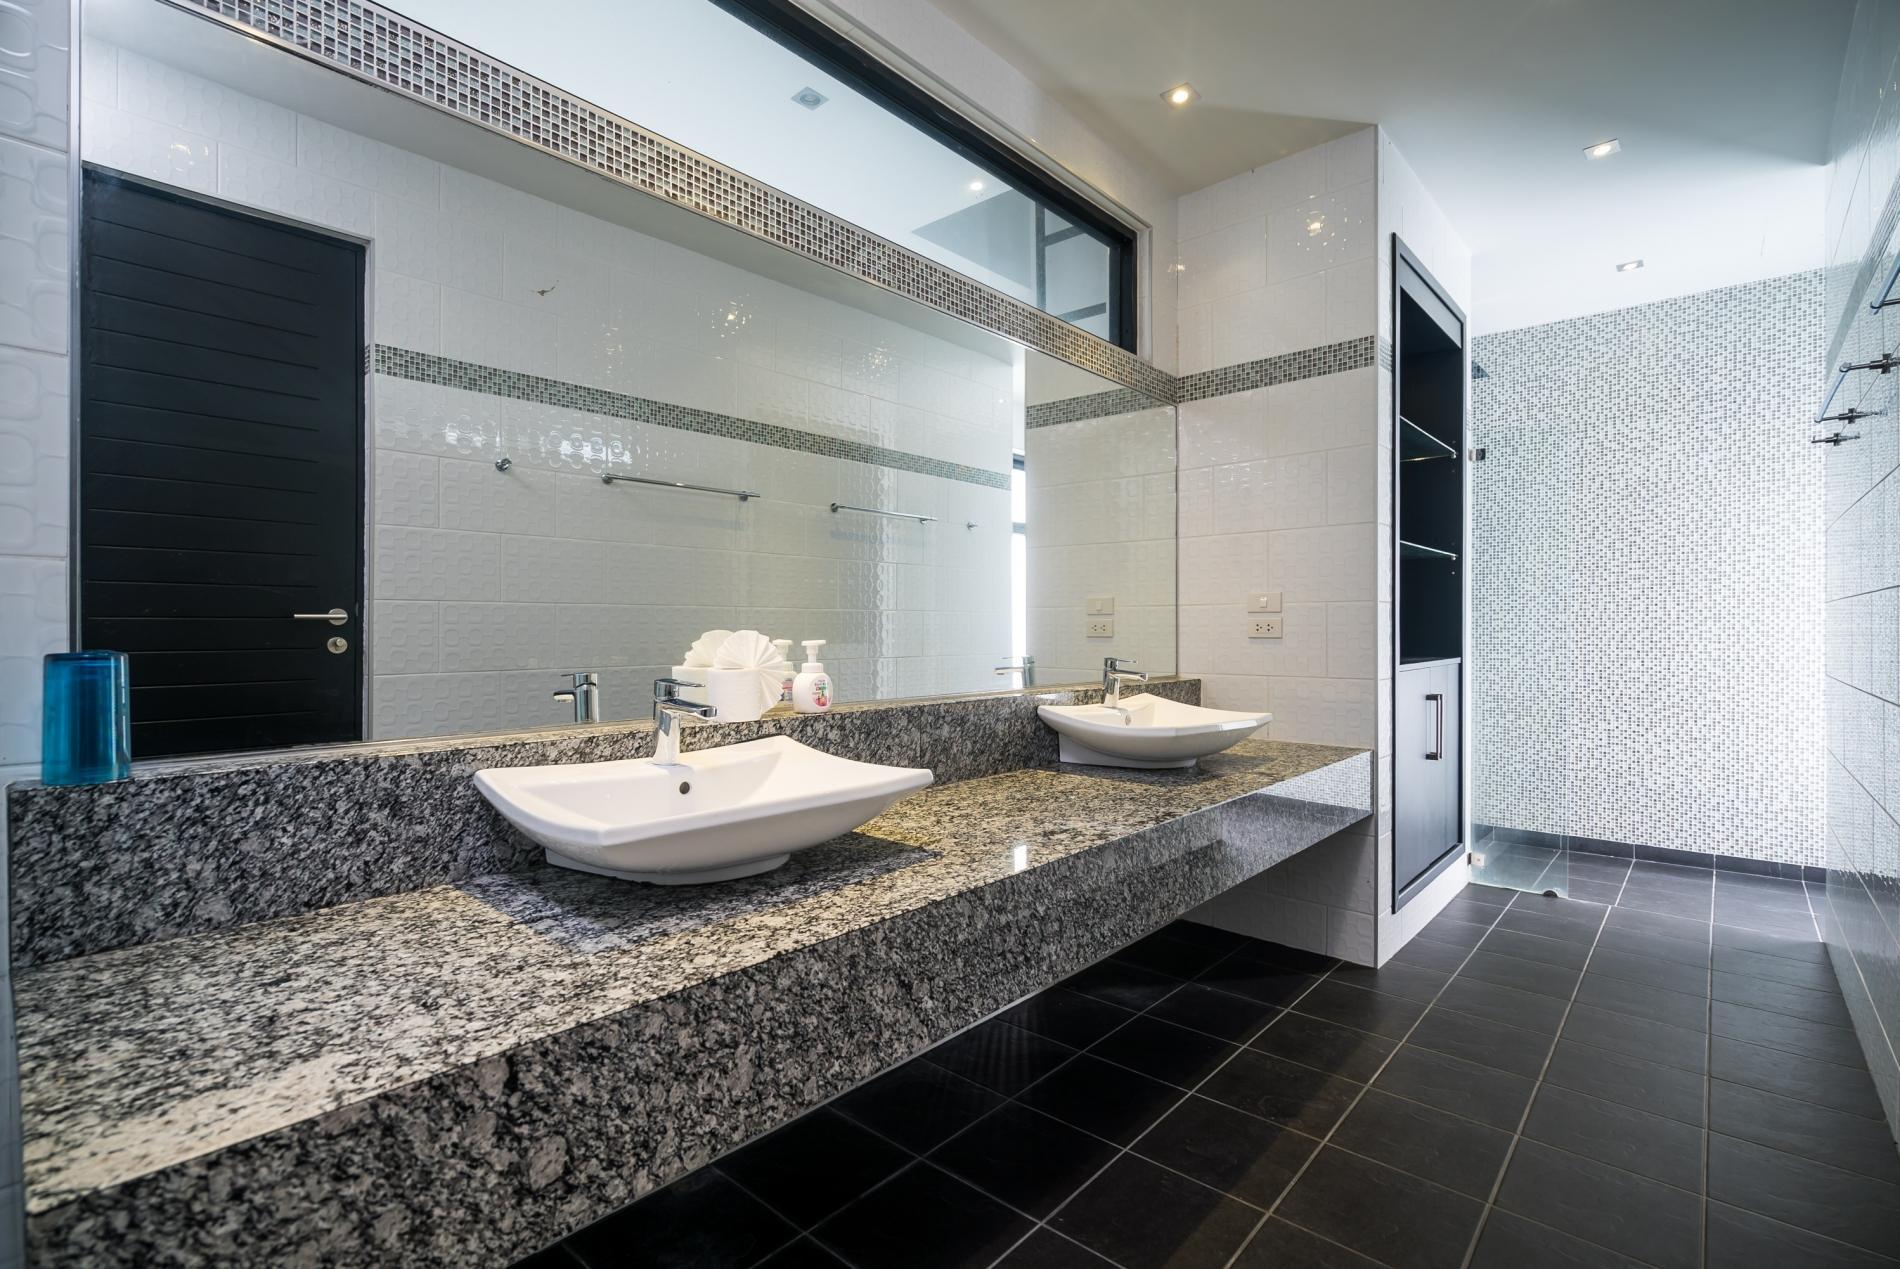 Apartment Diamond 272 - Modern 4 br private pool and garden villa photo 20358279